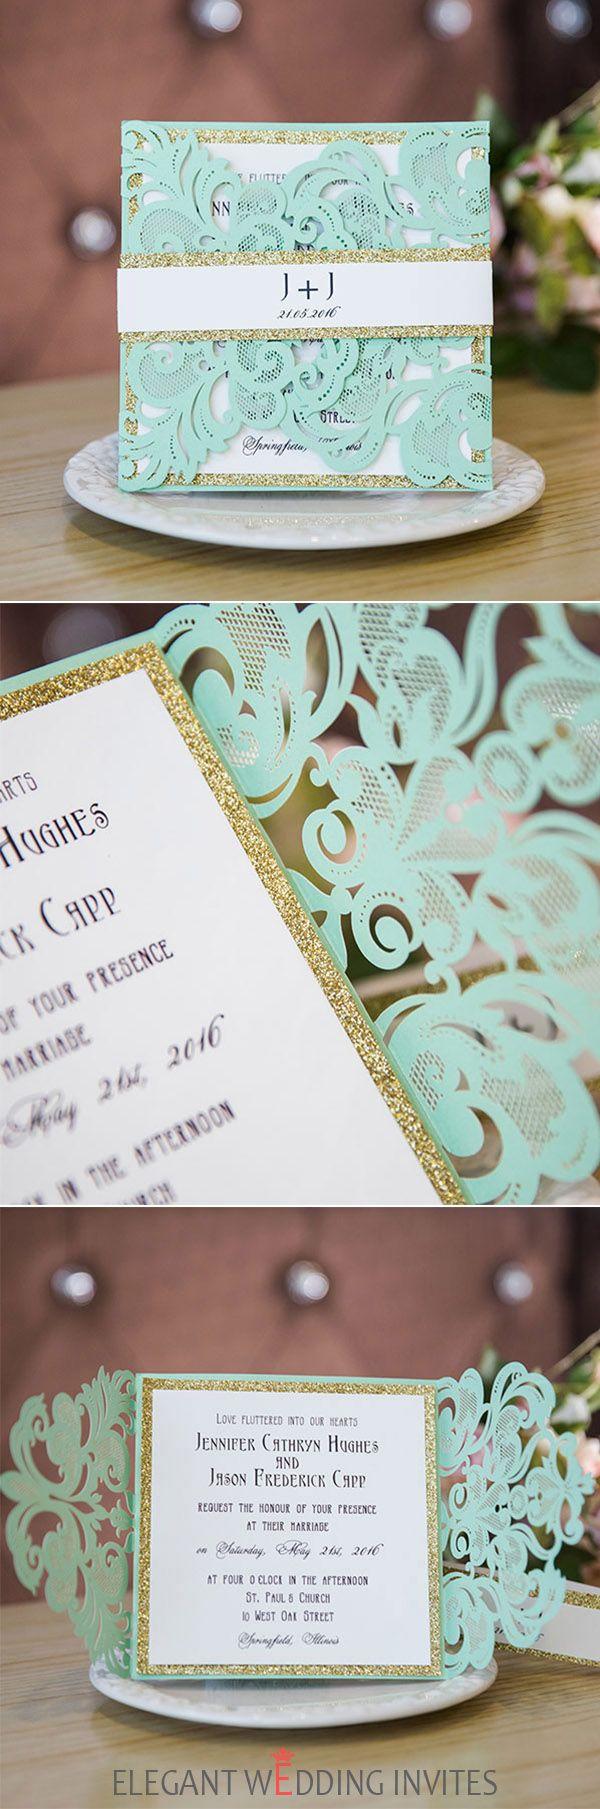 navy blue and kelly green wedding invitations%0A seafoam green glittery laser cut wedding invitations